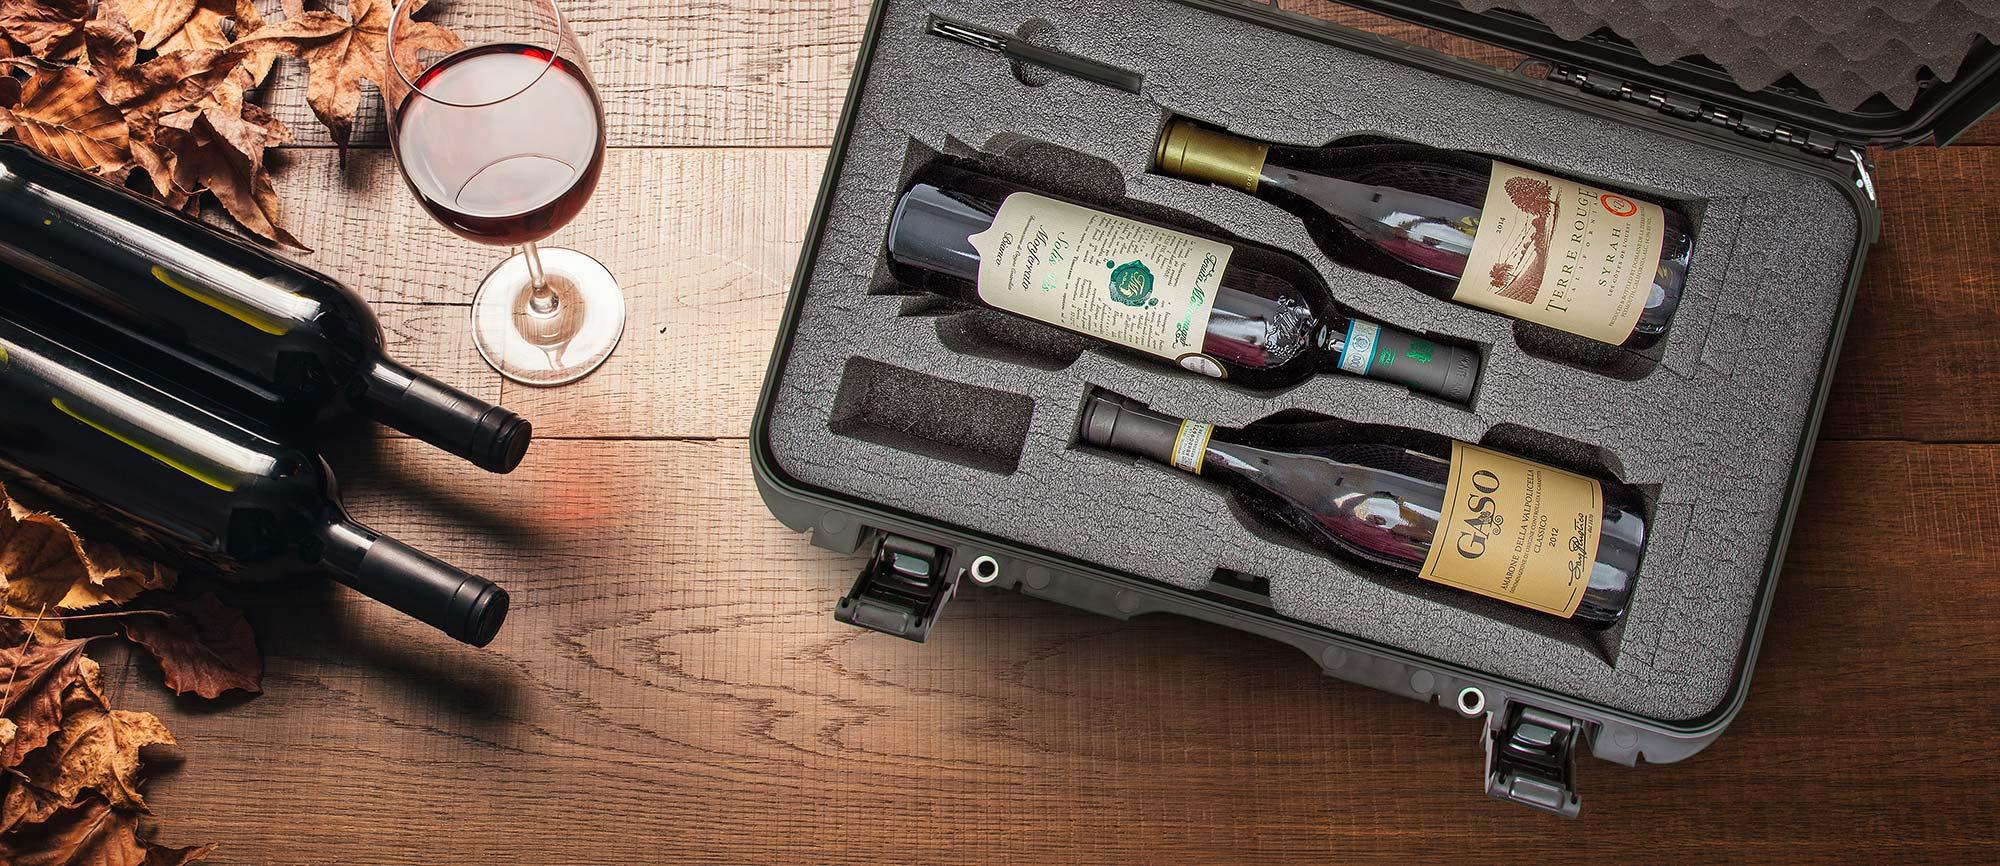 nanuk-935-6-wine-bottles-case-lifestyle